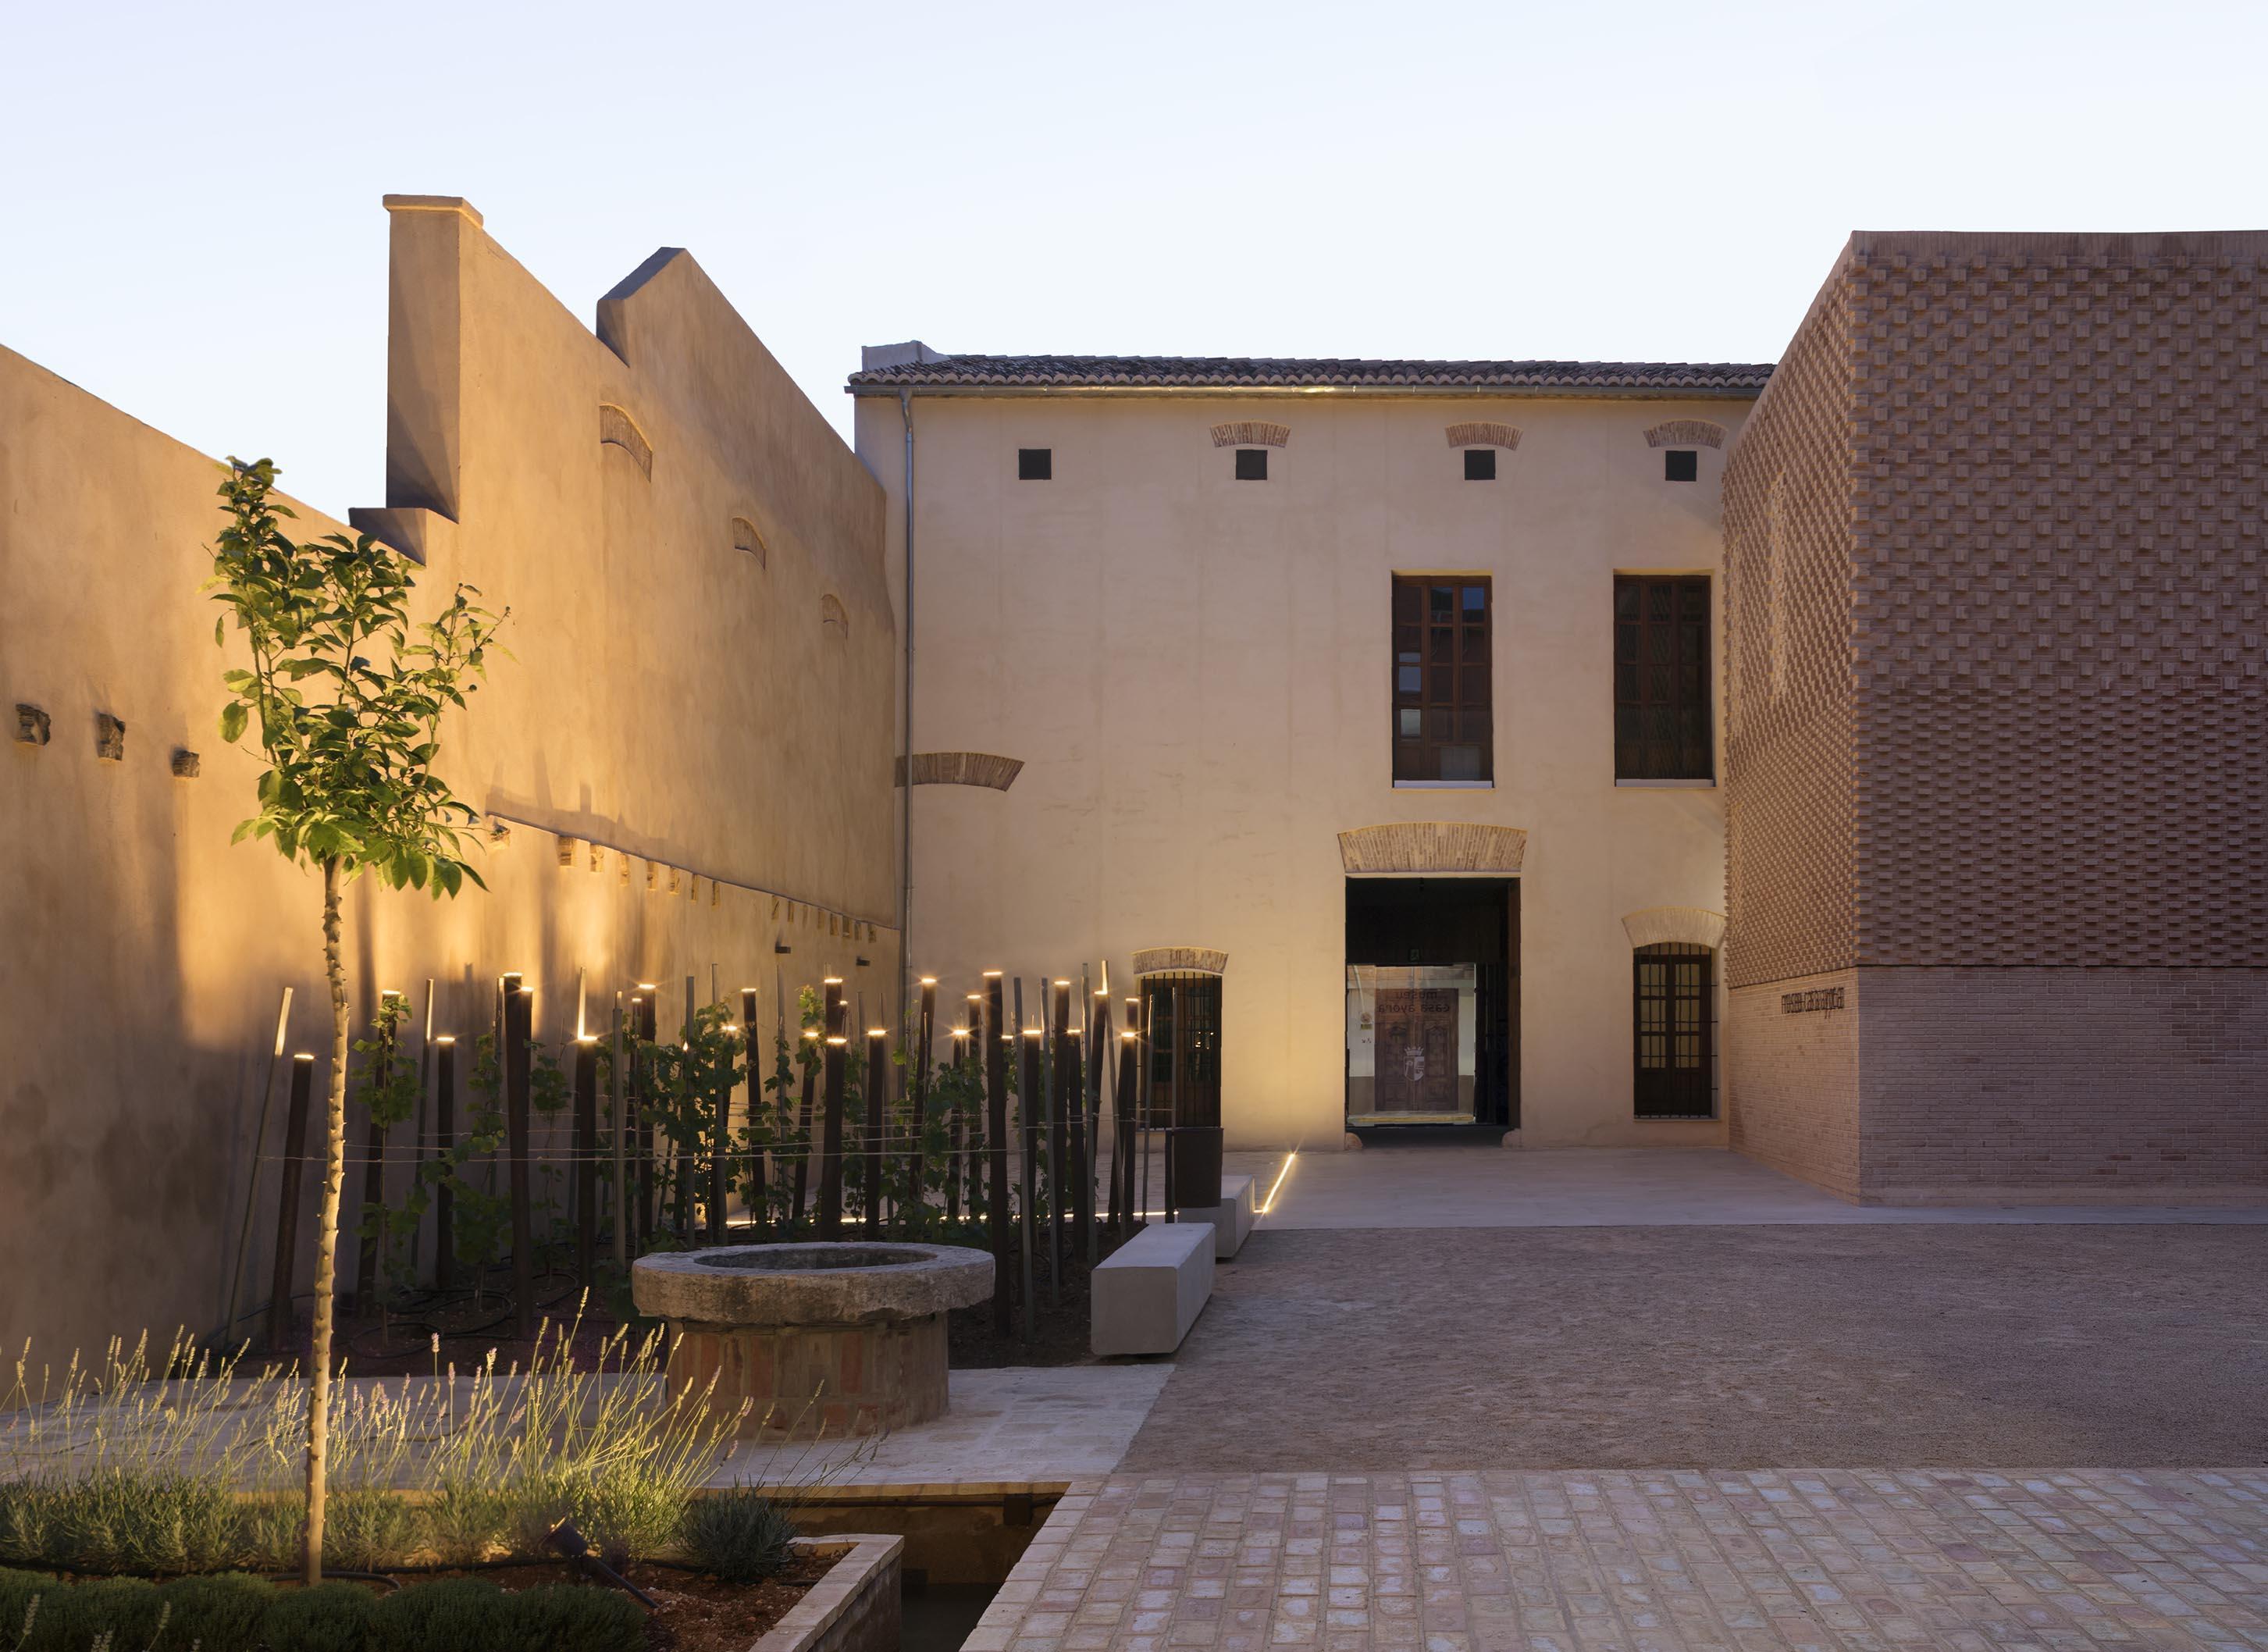 19B Museu Casa Ayora ©Milena Villalba 2020